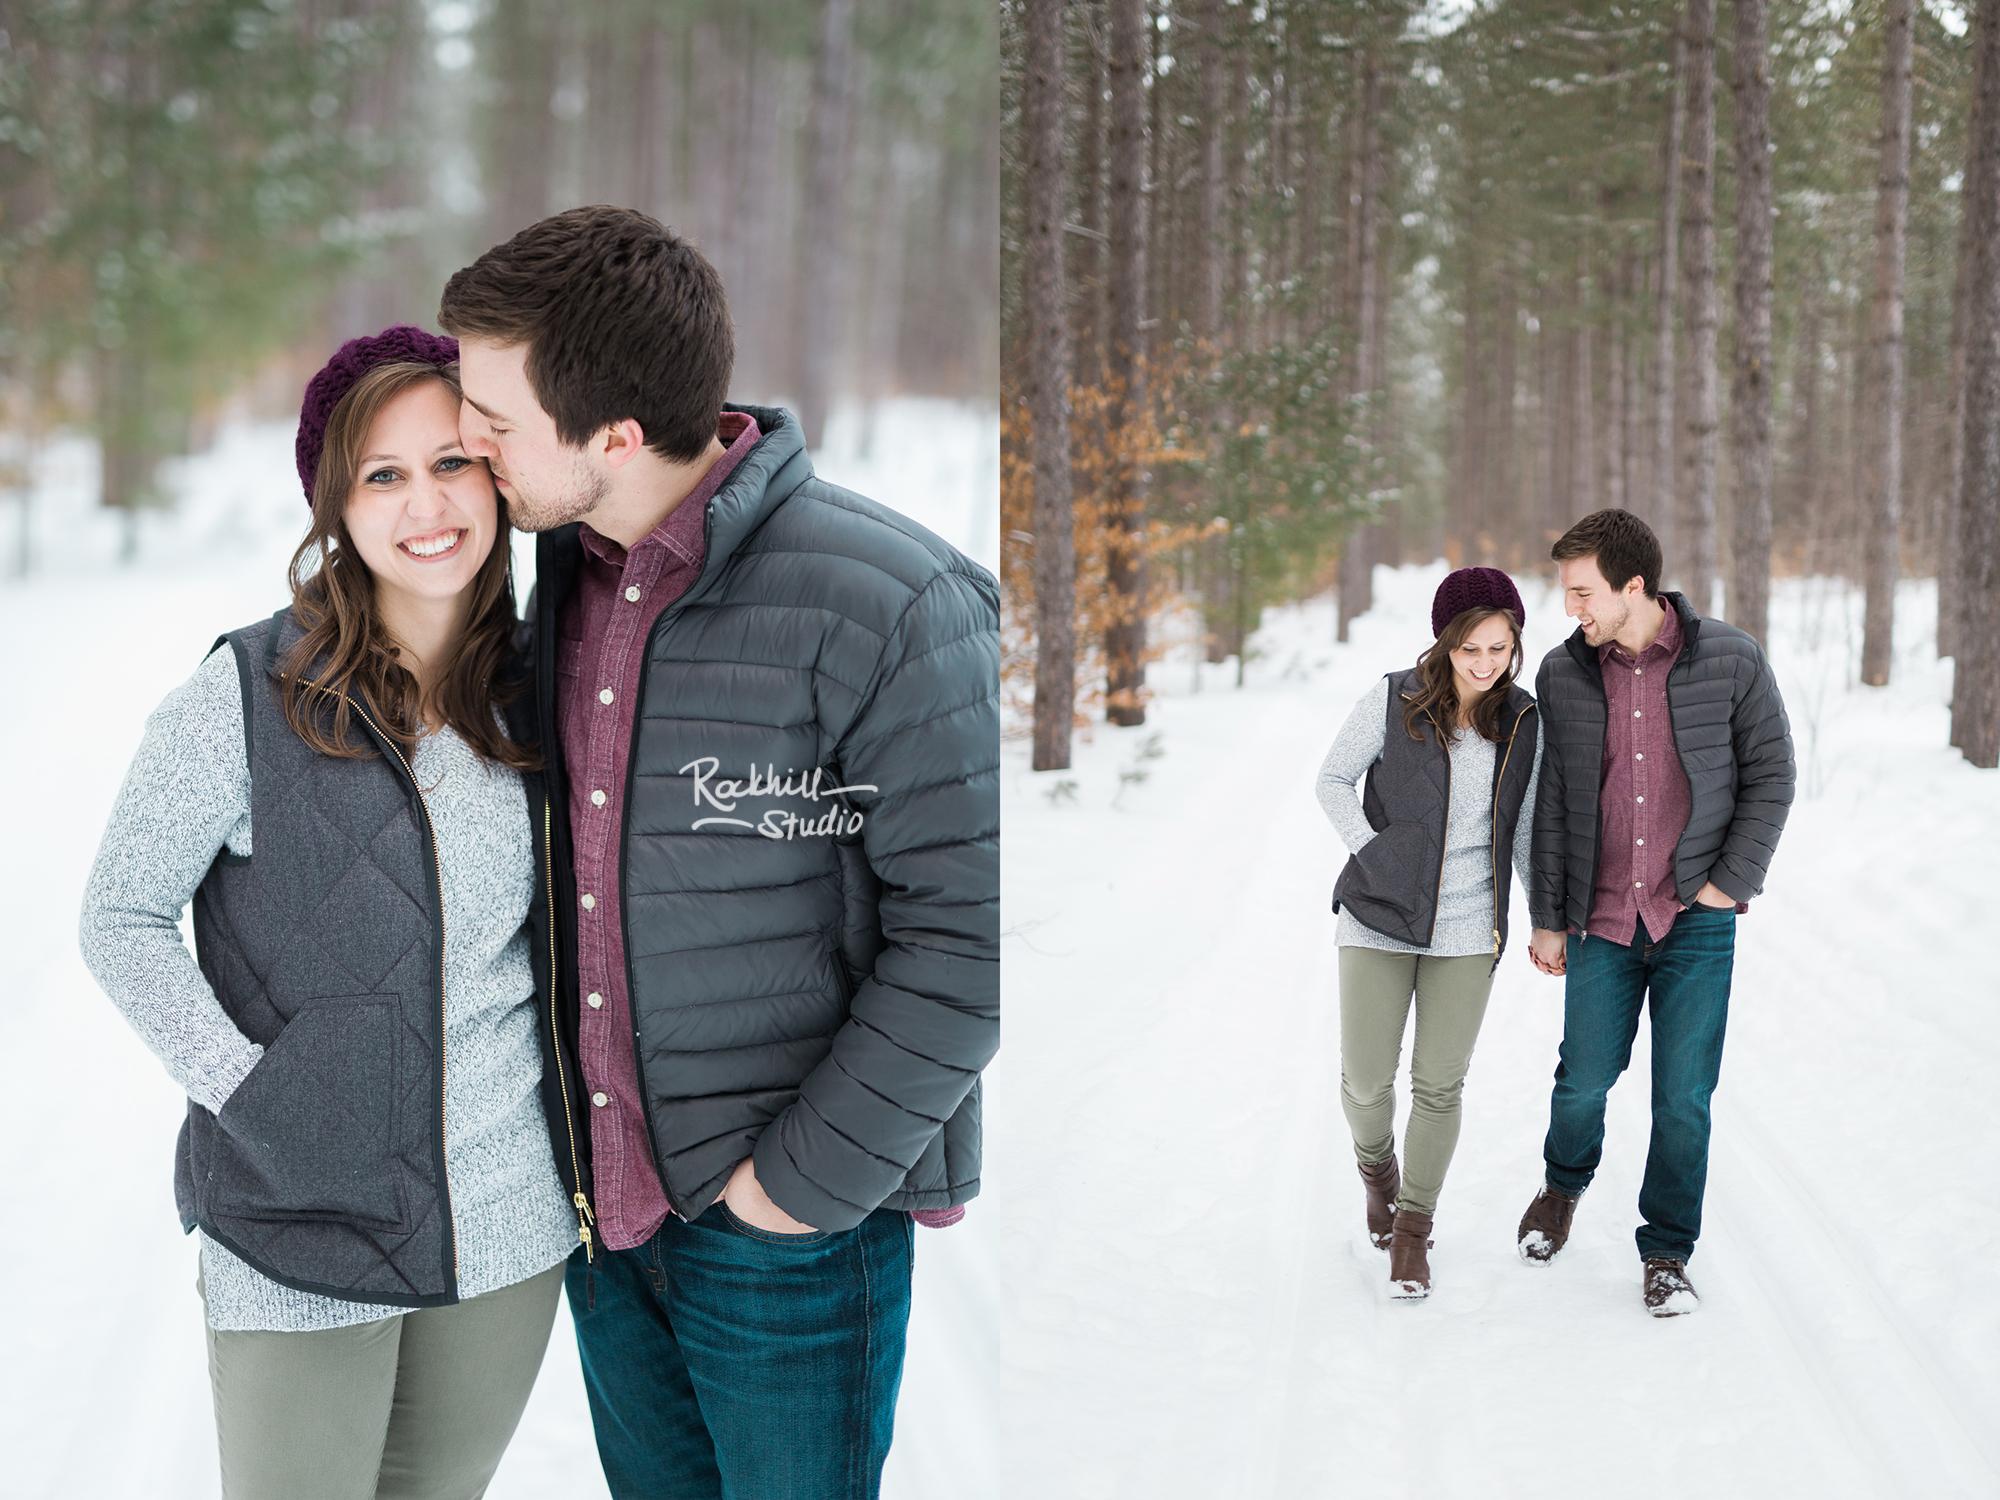 rockhill-studio-northern-michigan-engagement-photography-upper-peninsula-marquette-wedding-winter-26.jpg